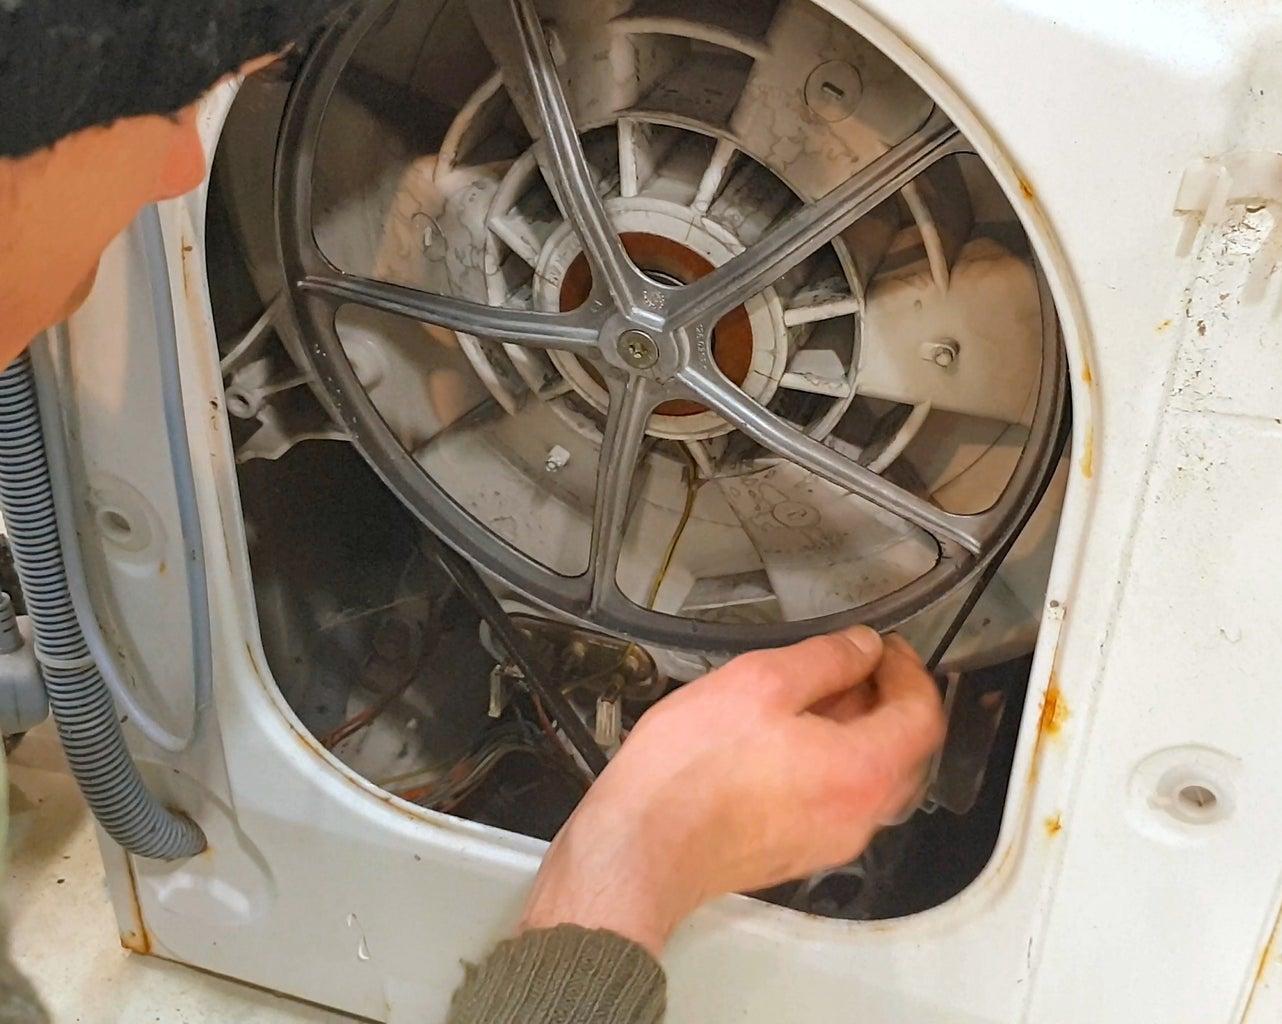 Dismantle the Washing Machine